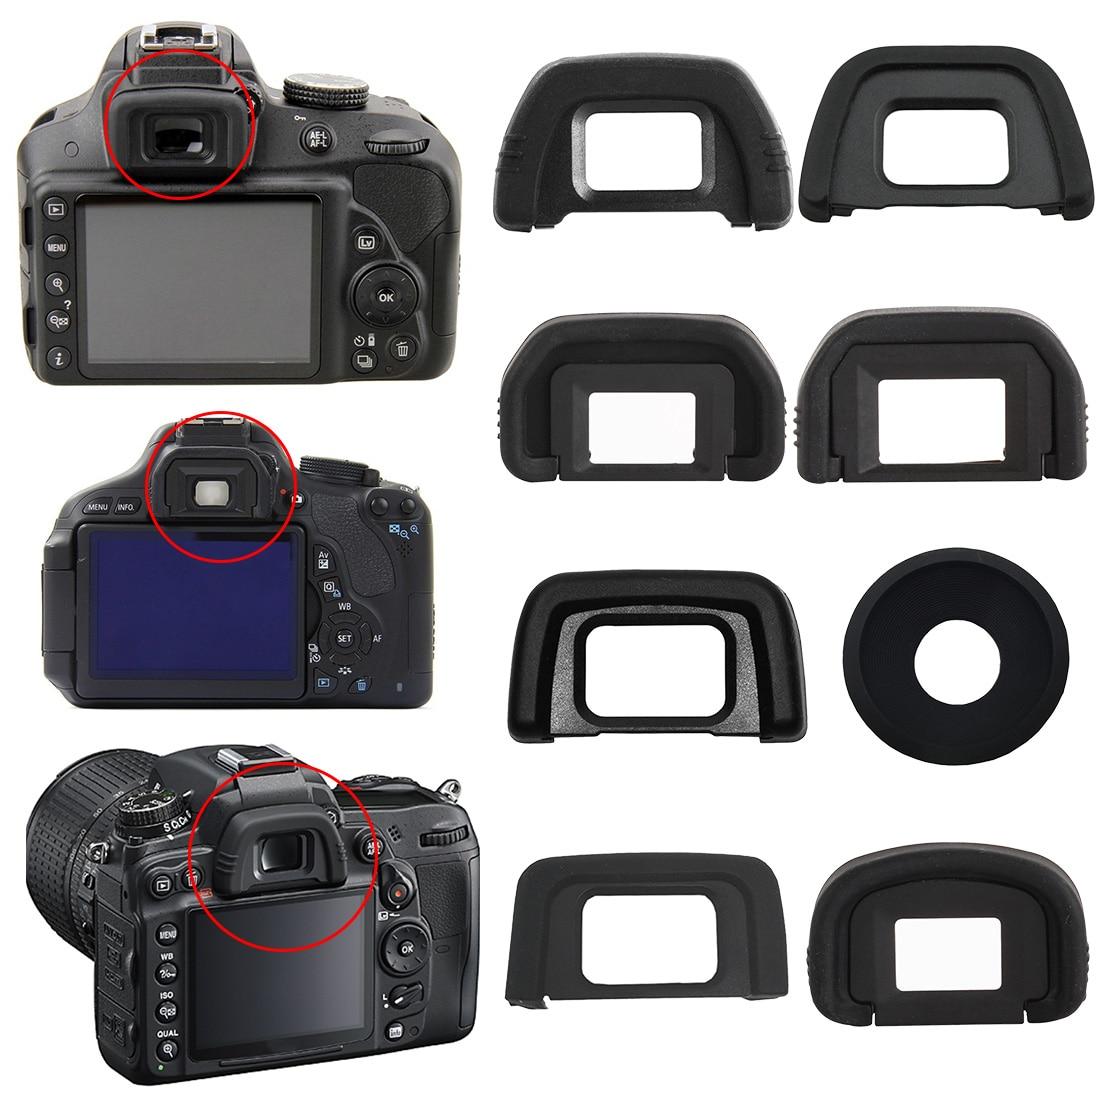 DK-19 DK-20 DK-21 DK-23 DK-24 DK-25 EF EB por ejemplo CE copa para ojo de goma ocular Eyecup para Nikon Canon cámara SLR